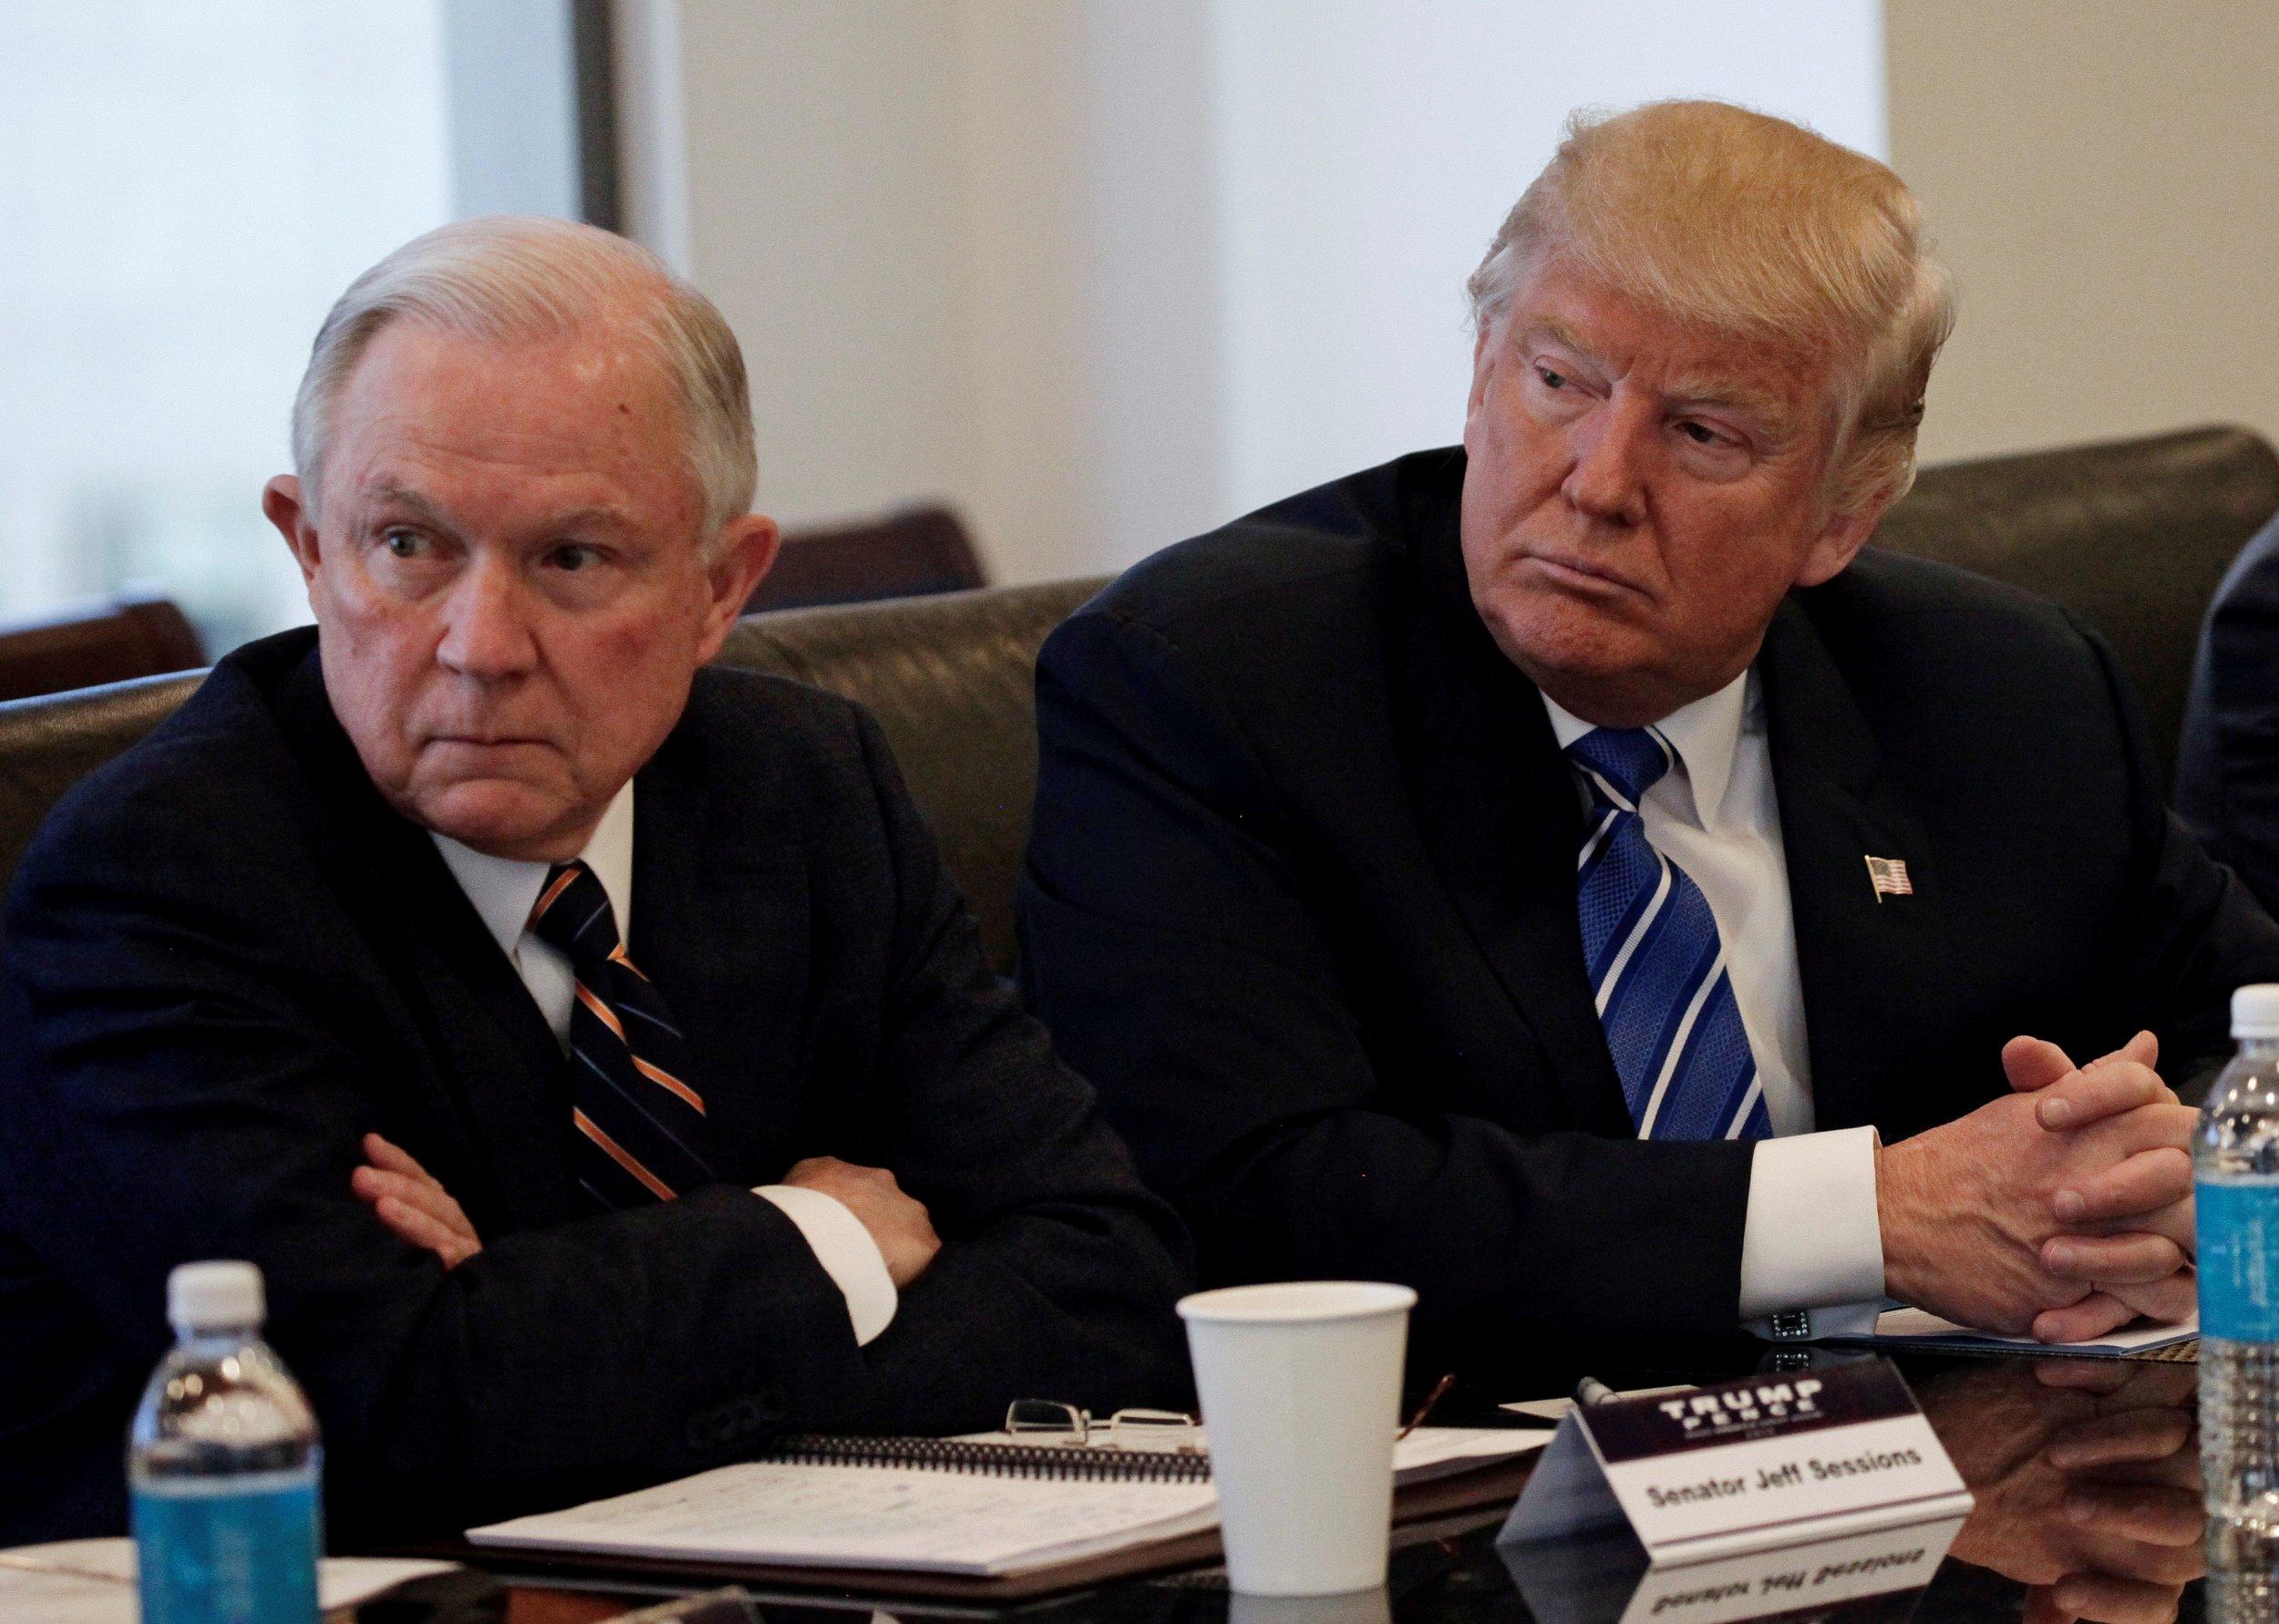 11_23_Sessions_Trump_01